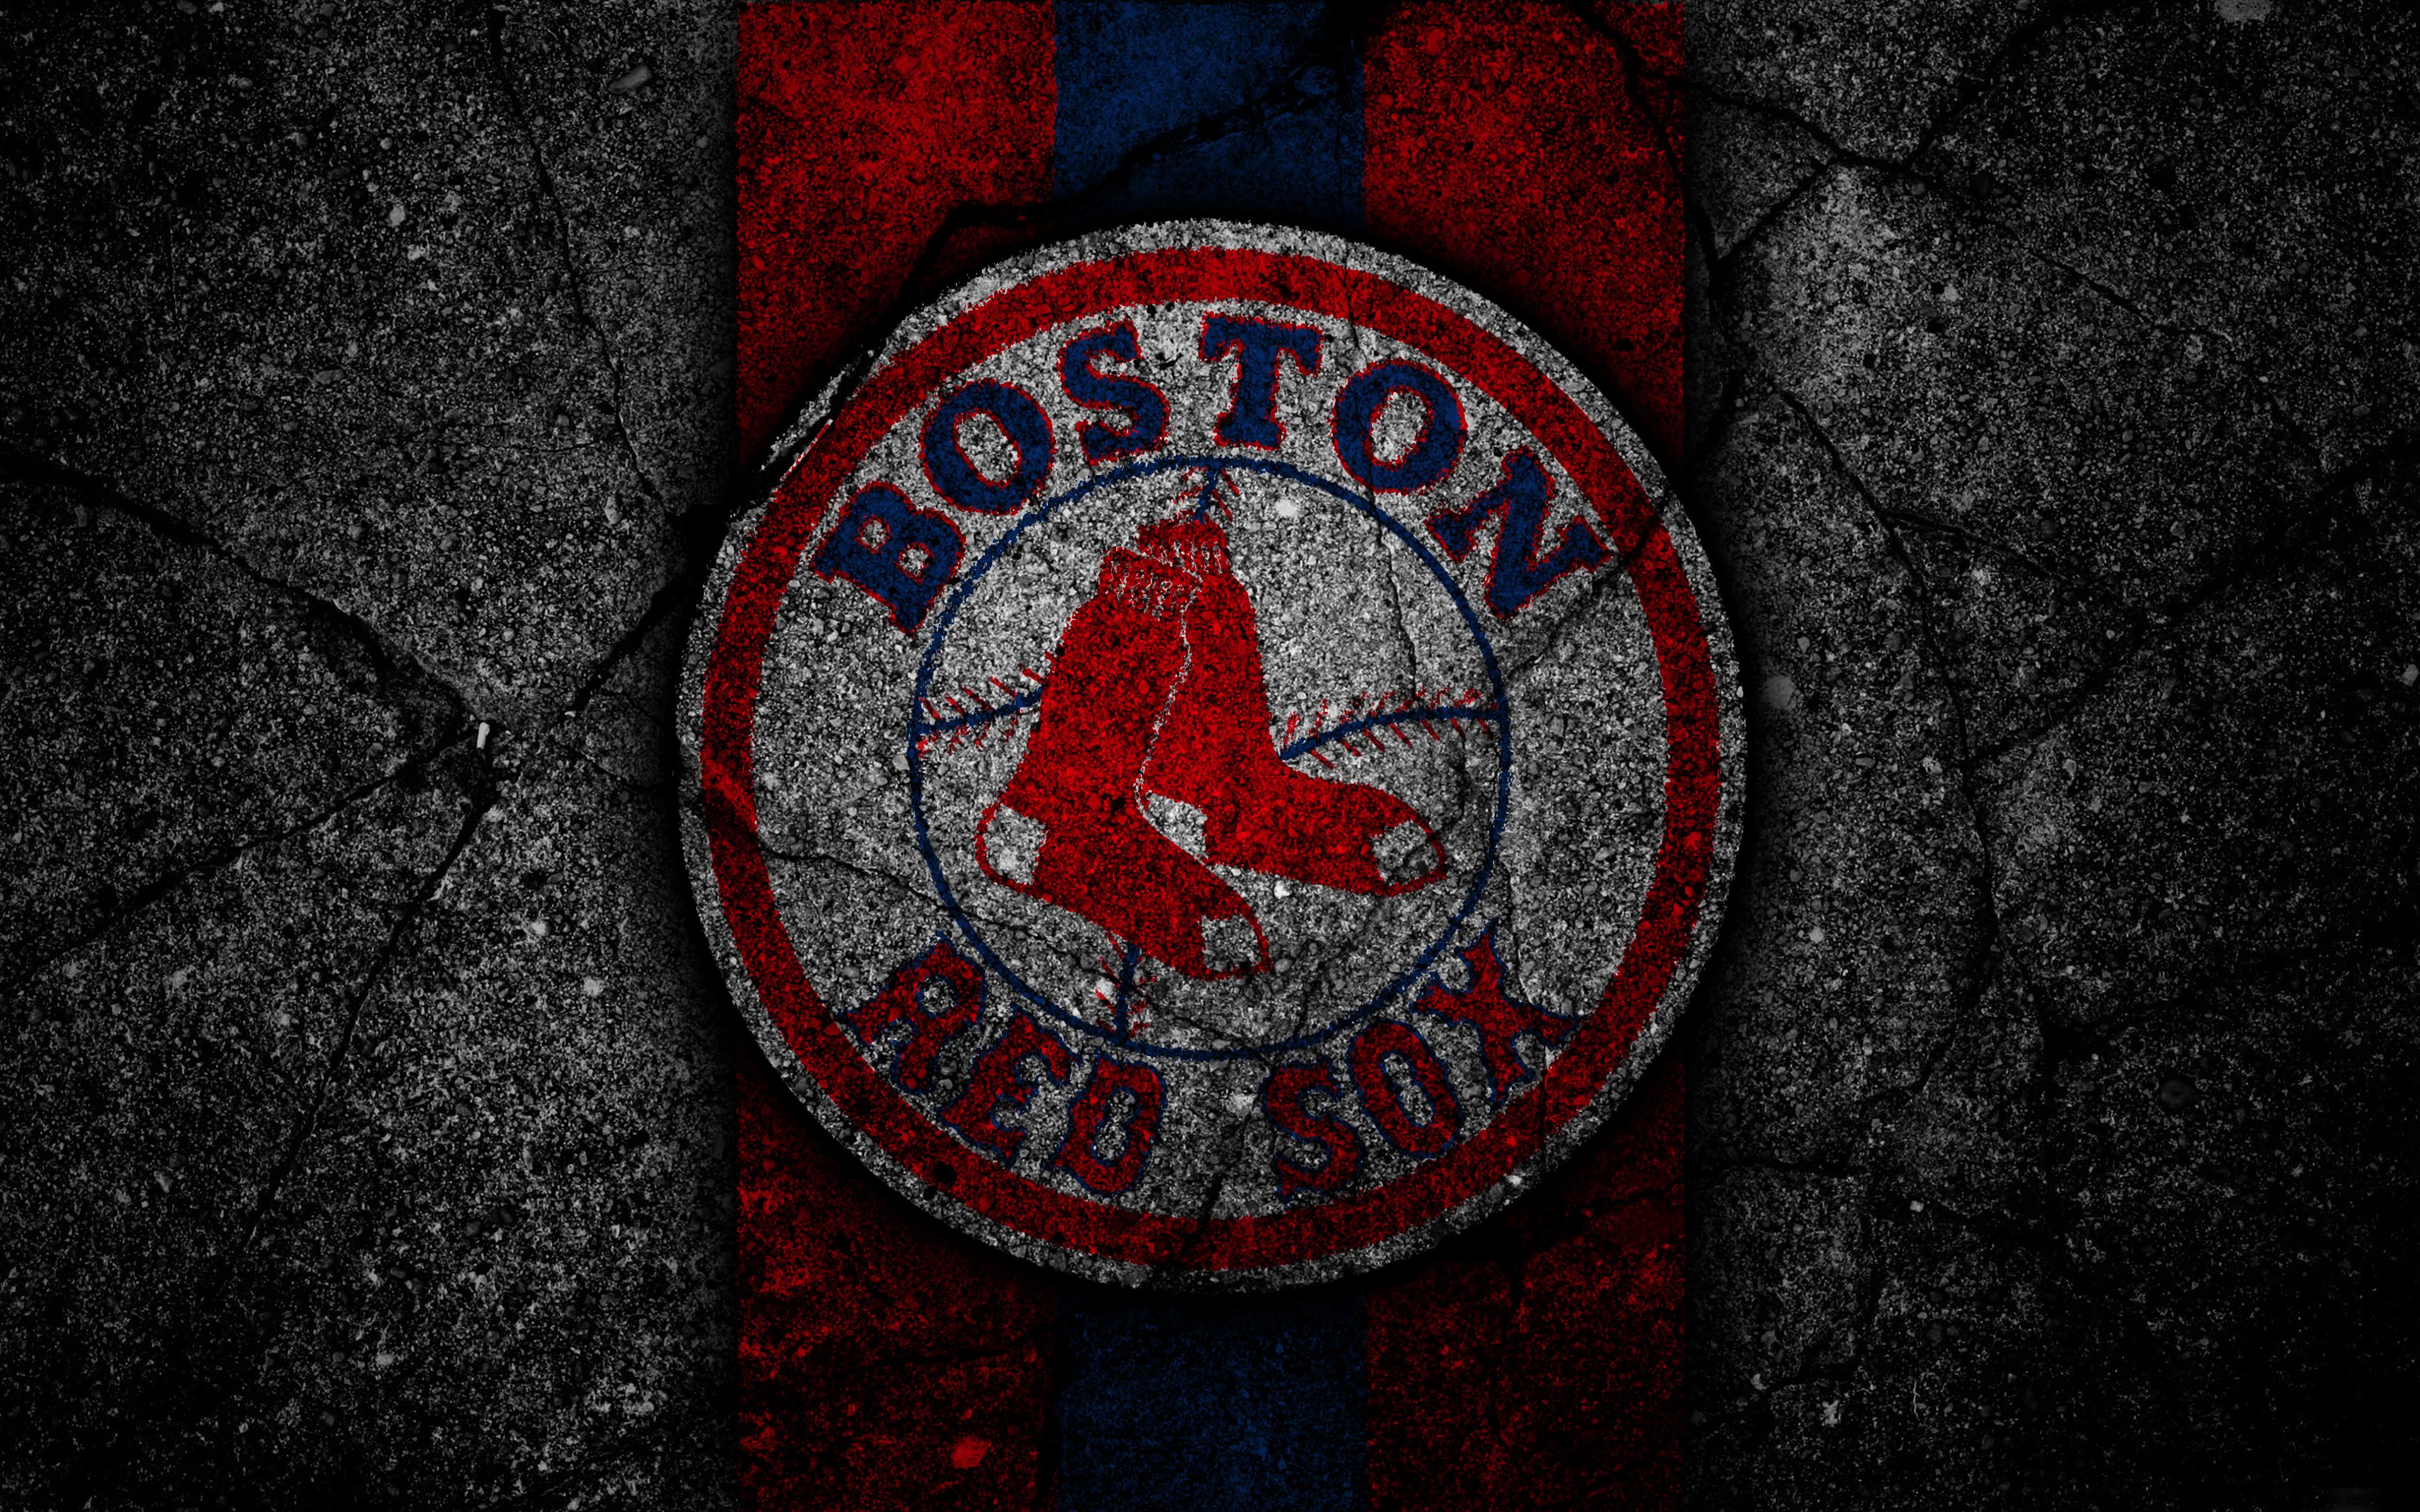 Boston Red Sox 4k Ultra HD Wallpaper Background Image 3840x2400